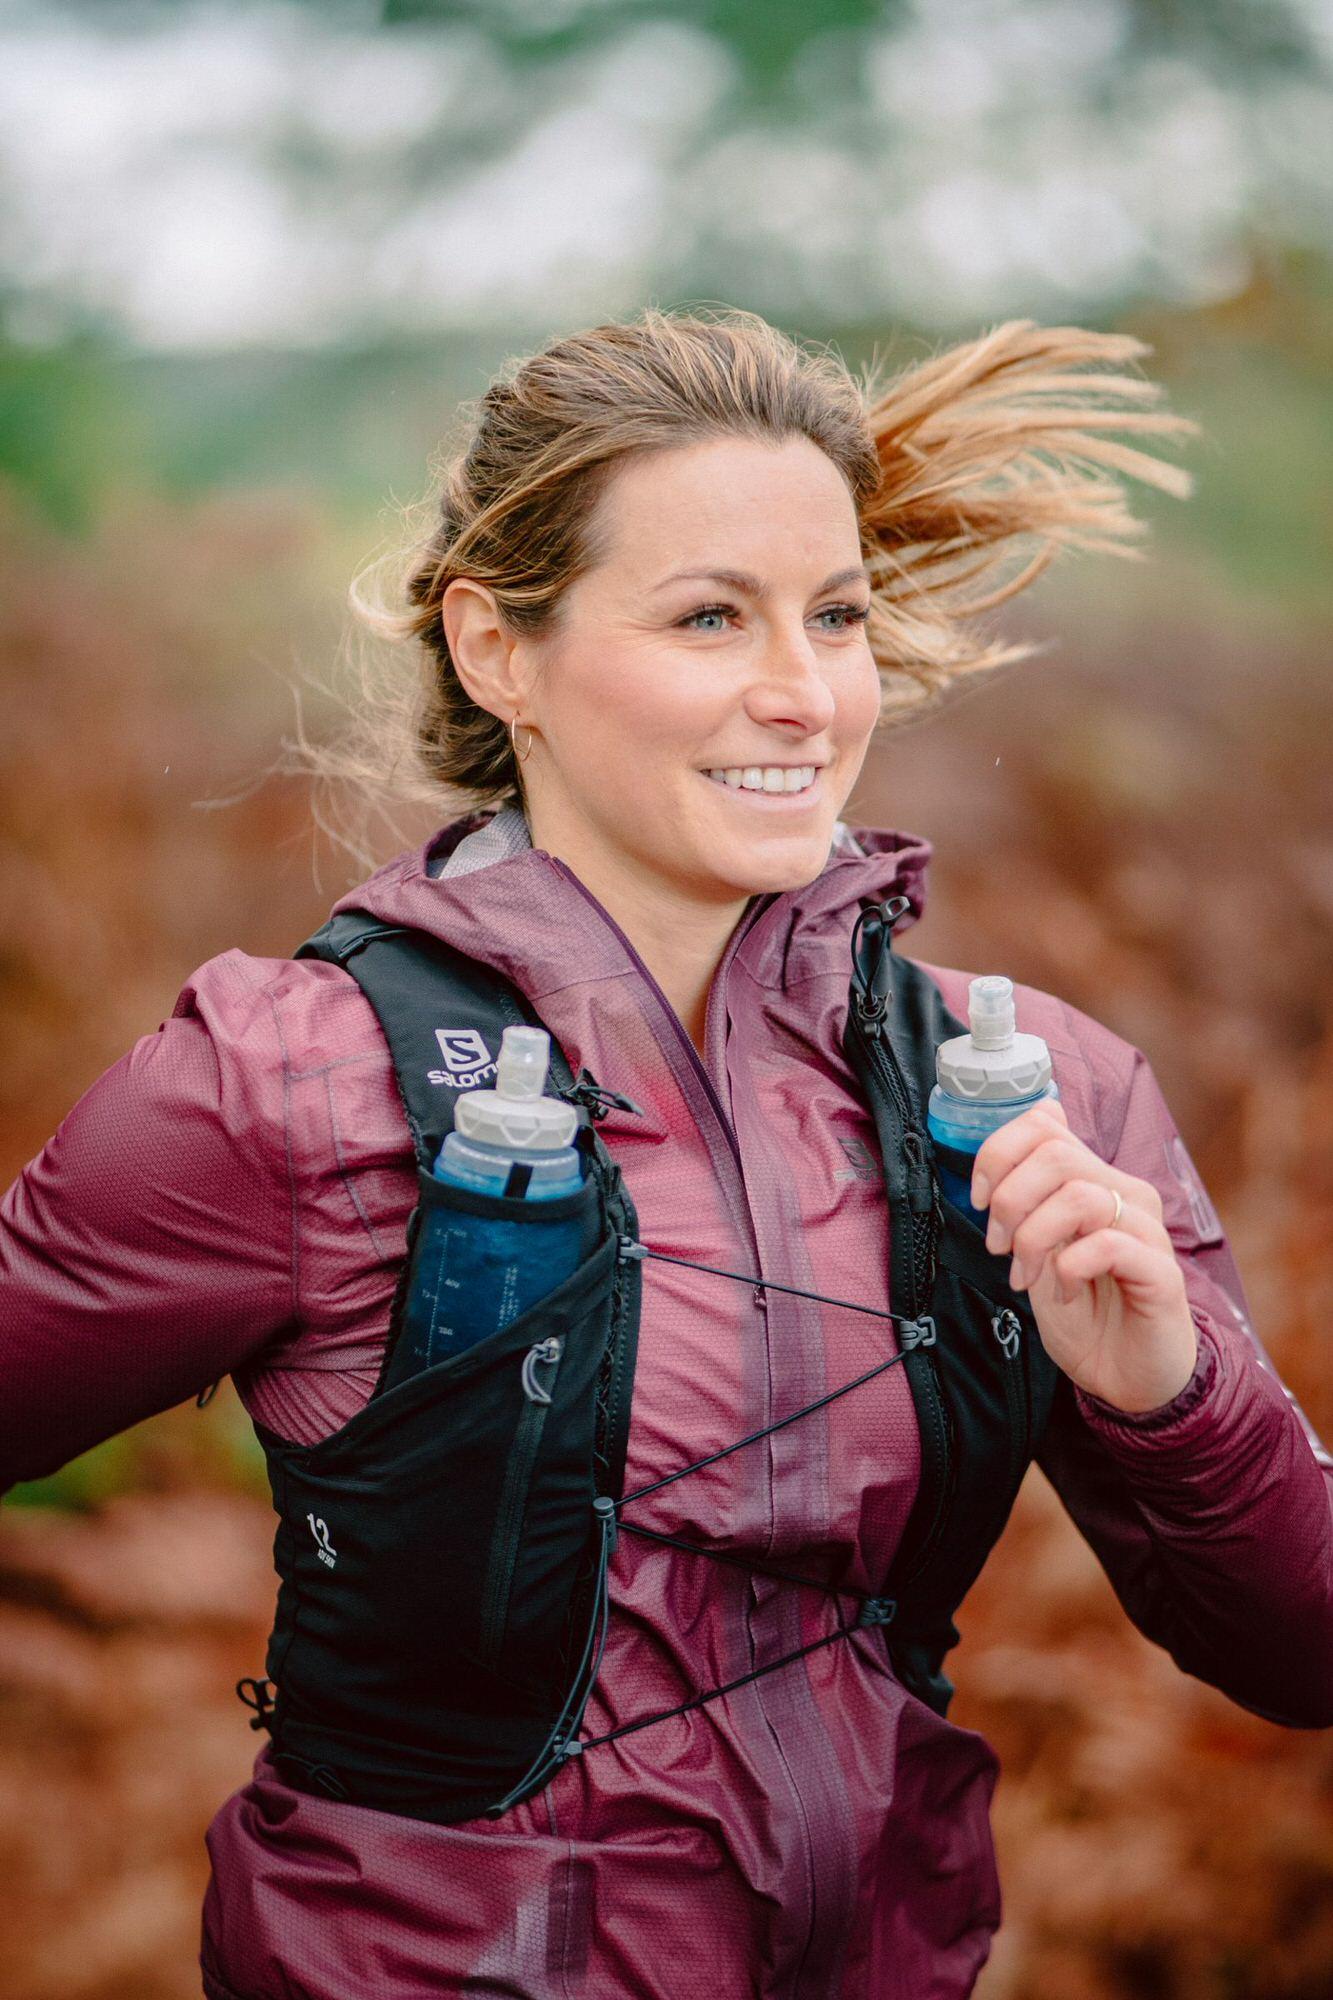 Trail running tips for beginners